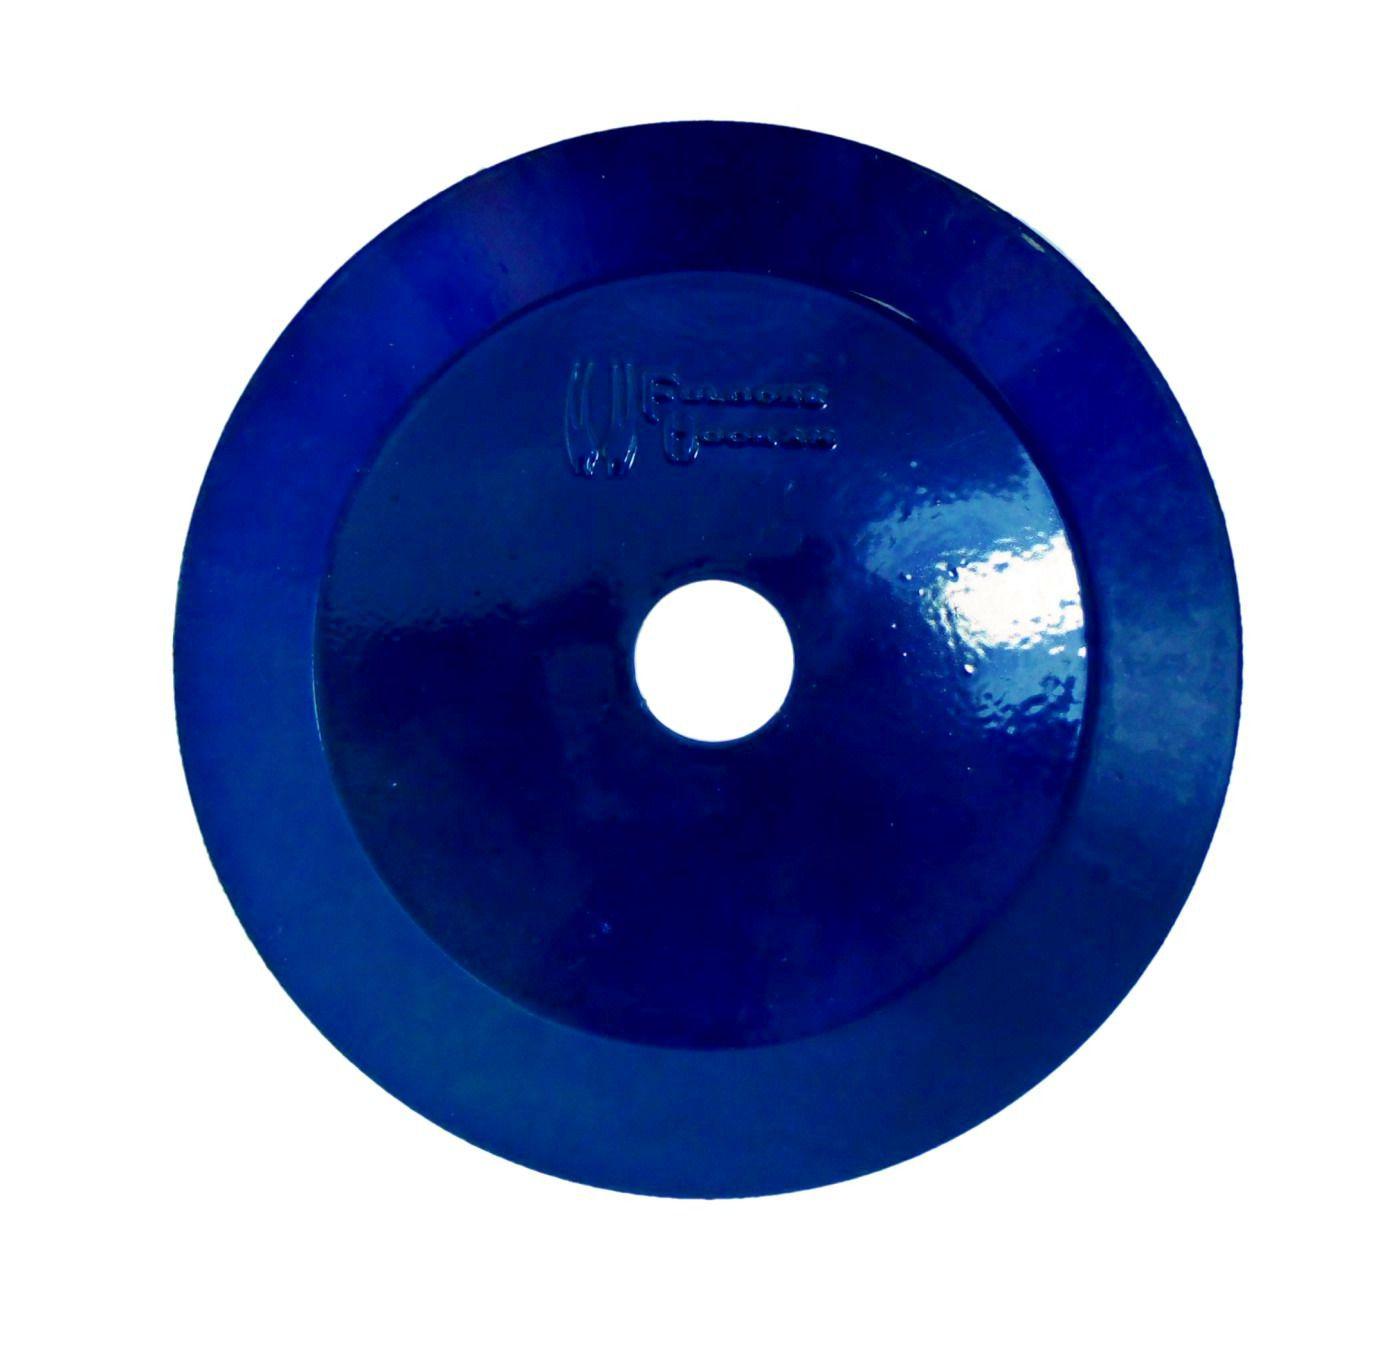 Prato para Narguile marca Fulgore em metal pintado. 15cm de diâmetro, 2,5cm de furo. Azul Escuro